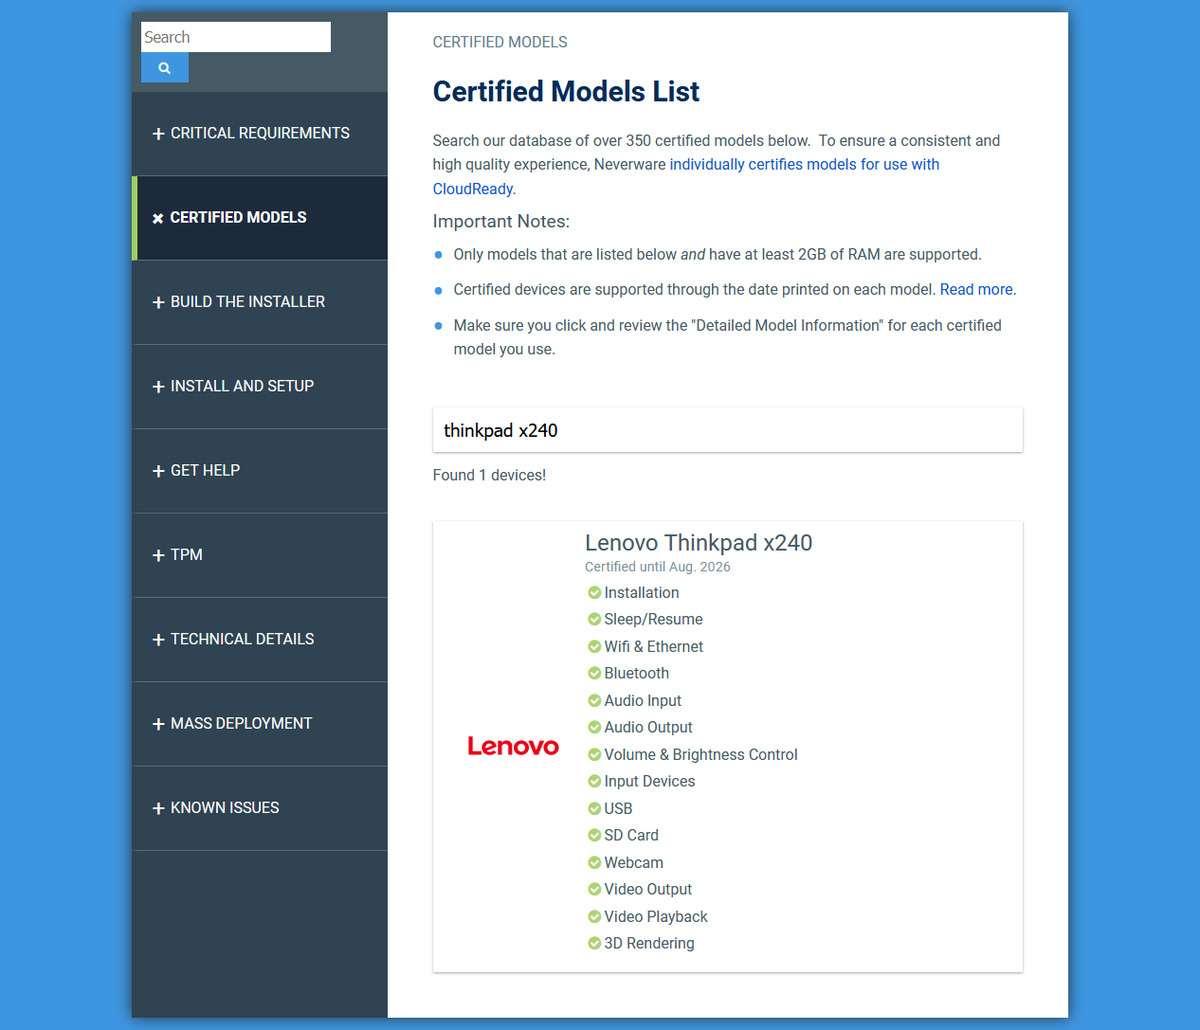 Neverware CloudReady Lenovo ThinkPad X240 feature support